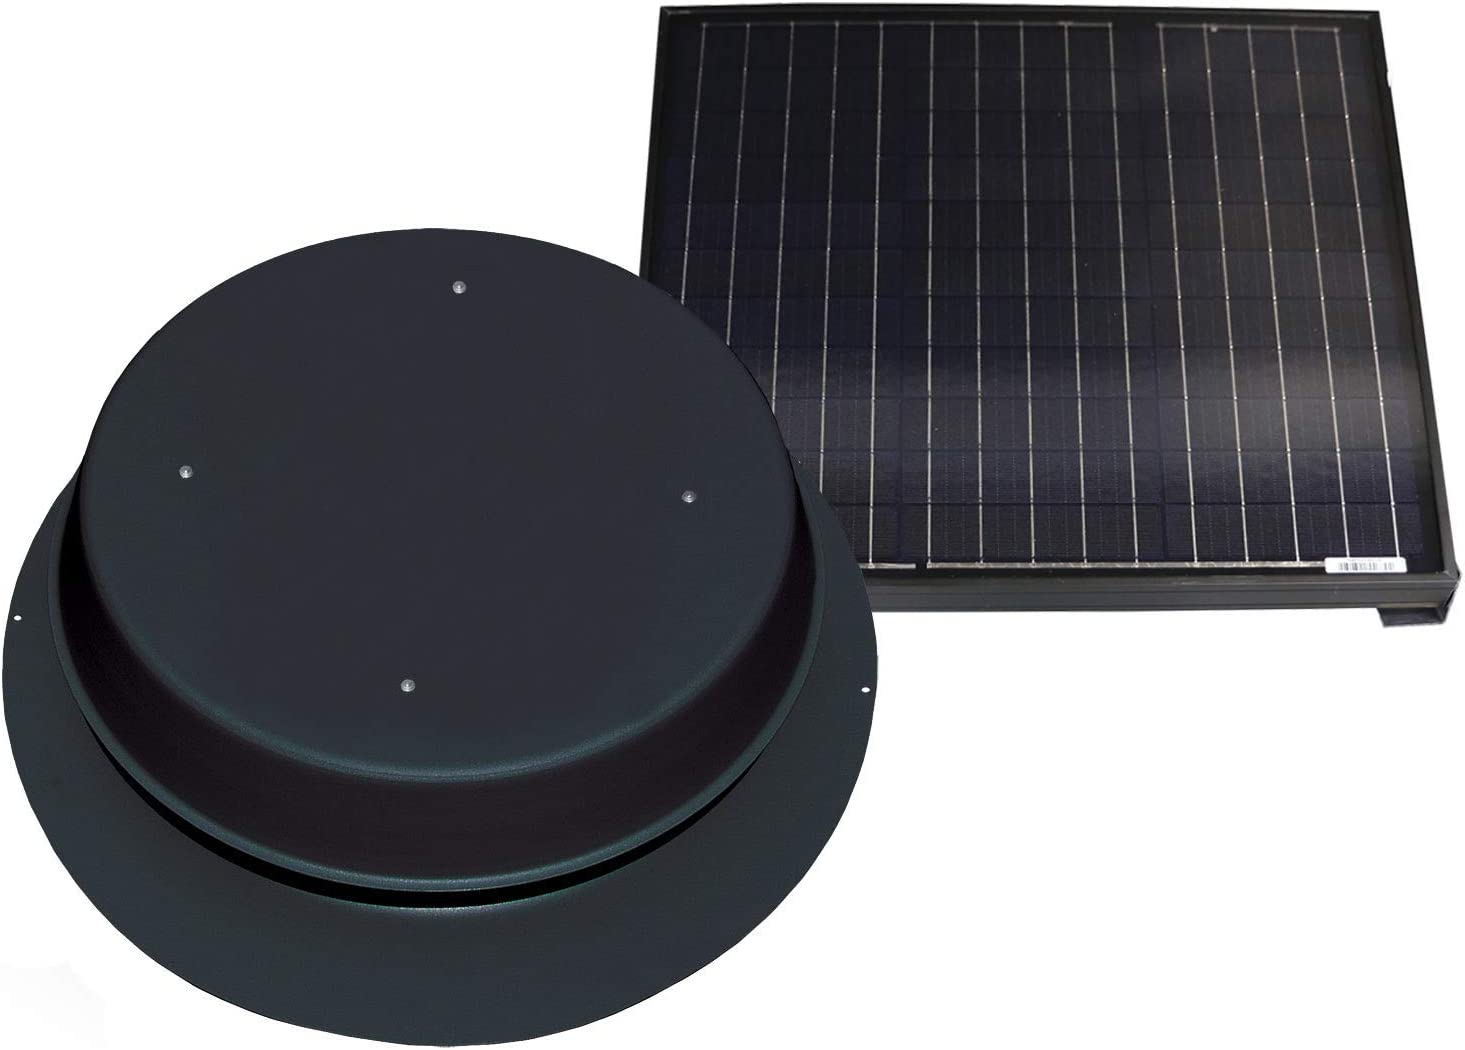 Solar Attic Fan - 65 Watts 3350 Comes sq. with So Remote ft. Virginia Beach Mall Under blast sales